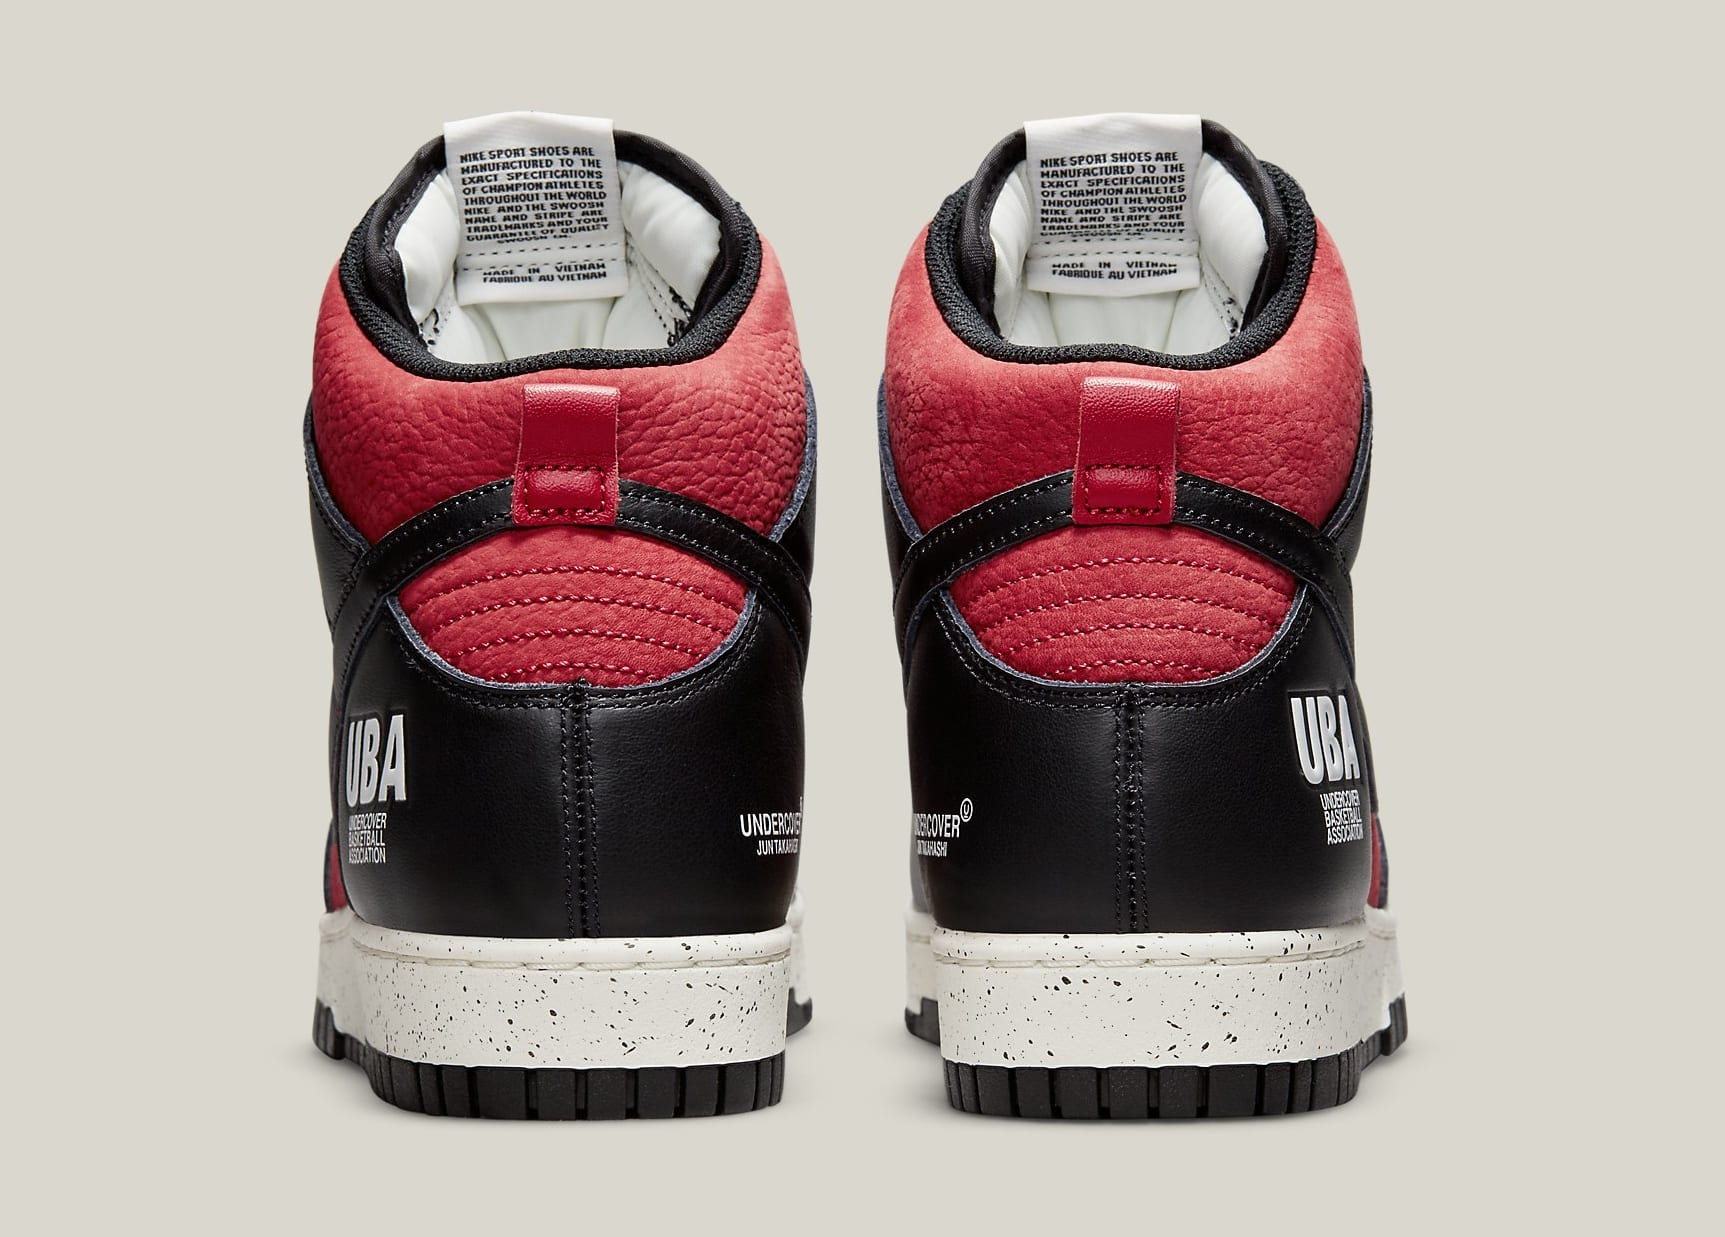 Undercover x Nike Dunk High 1985 'Gym Red' DD9401-600 Heel